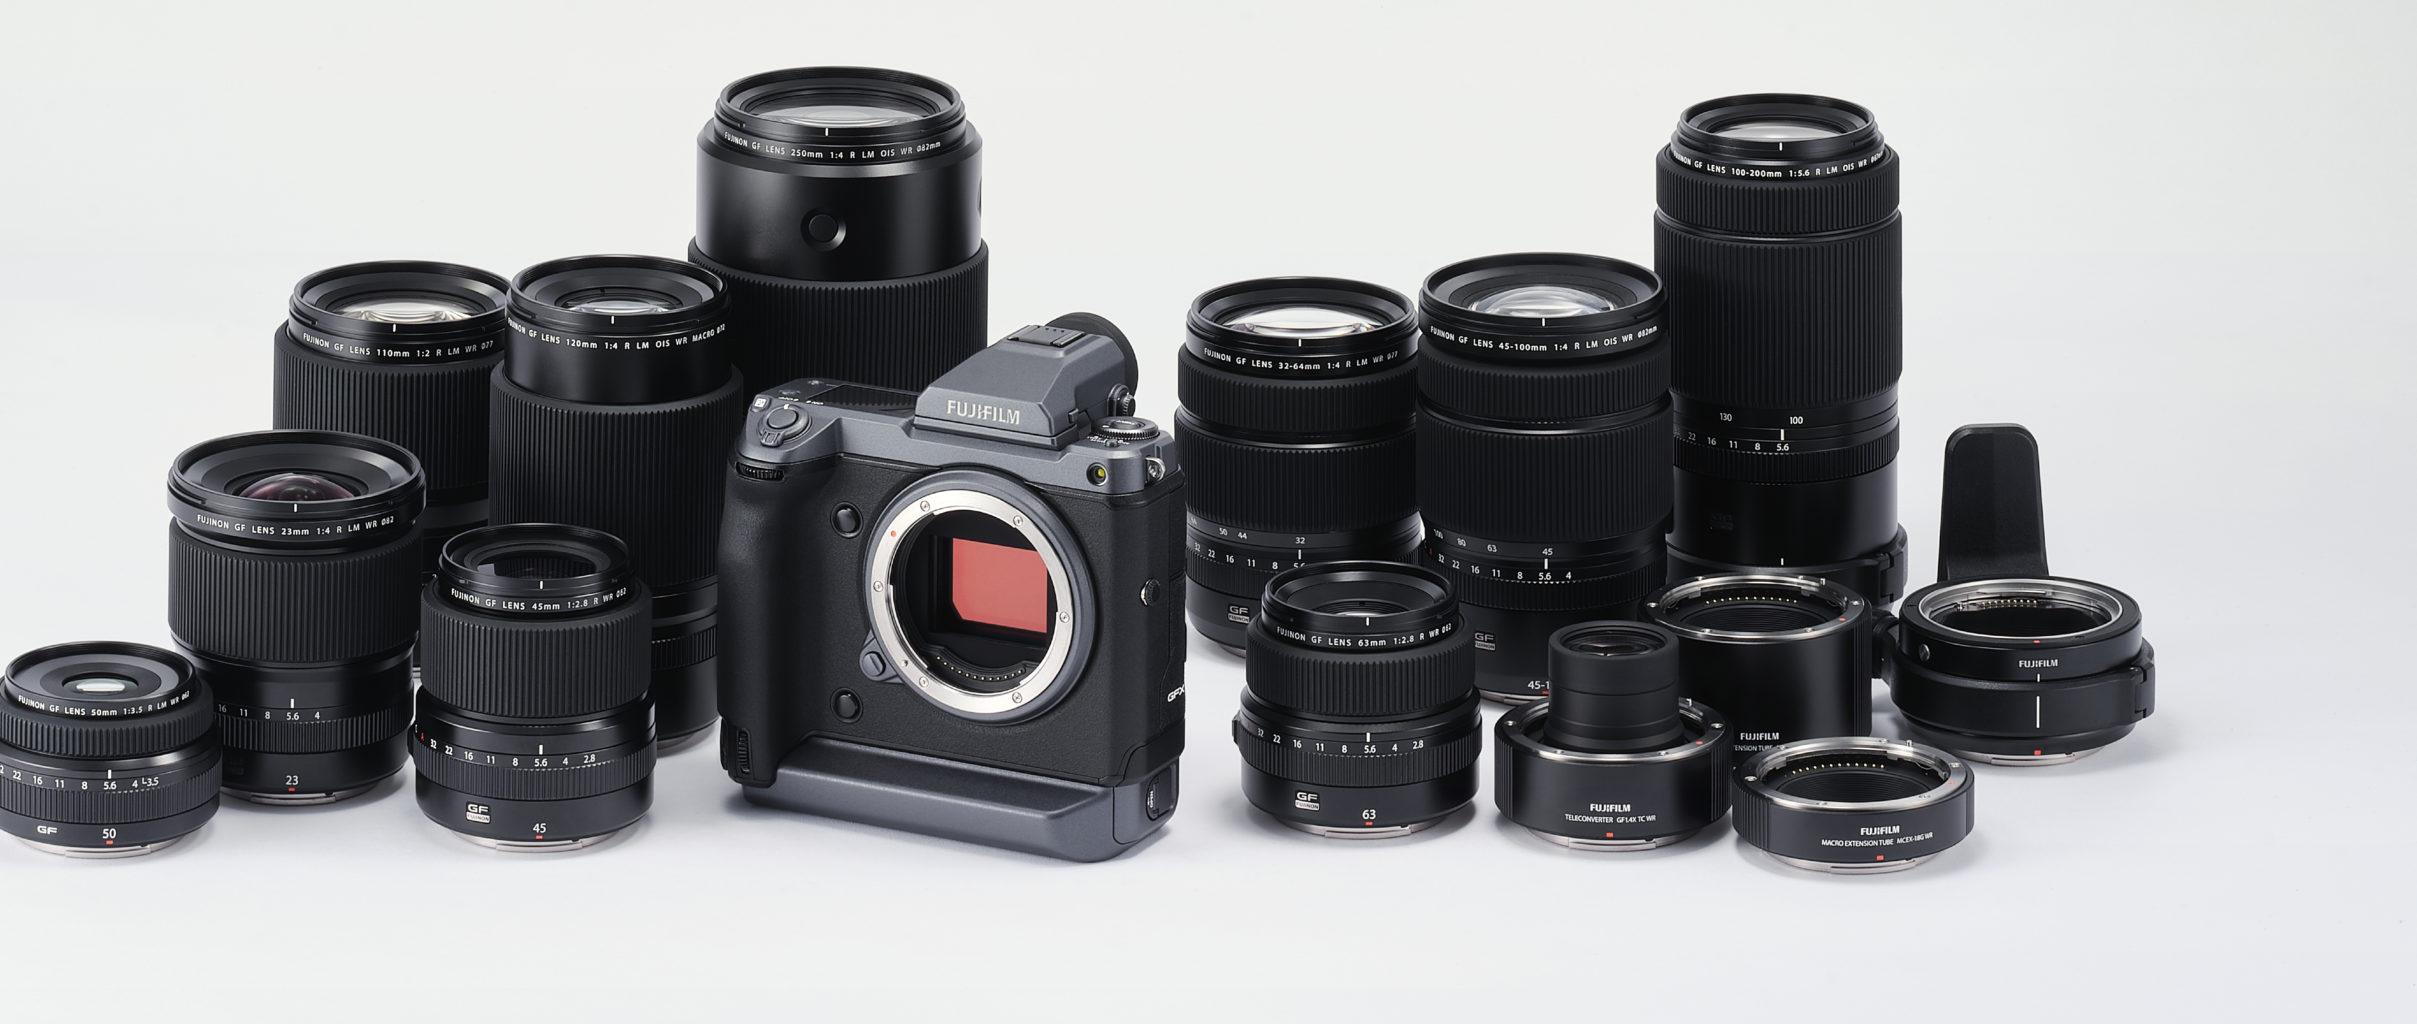 Fuji-GFX100S, Kamera,Mittelformat,Gehäuse